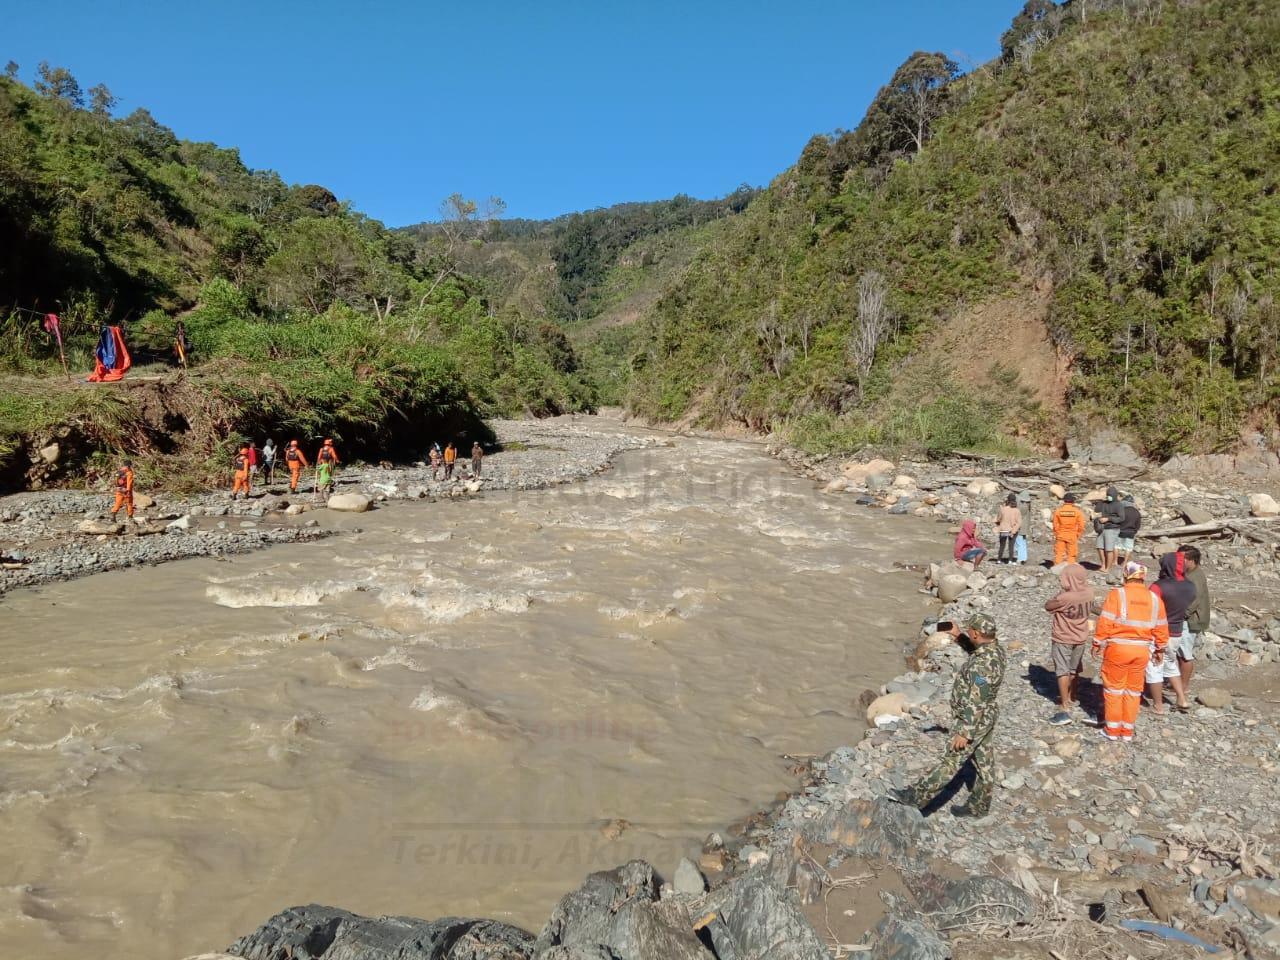 Basarnas Cari Warga Manokwari Terseret Arus di Sungai Didohu 1 IMG 20210315 WA0021